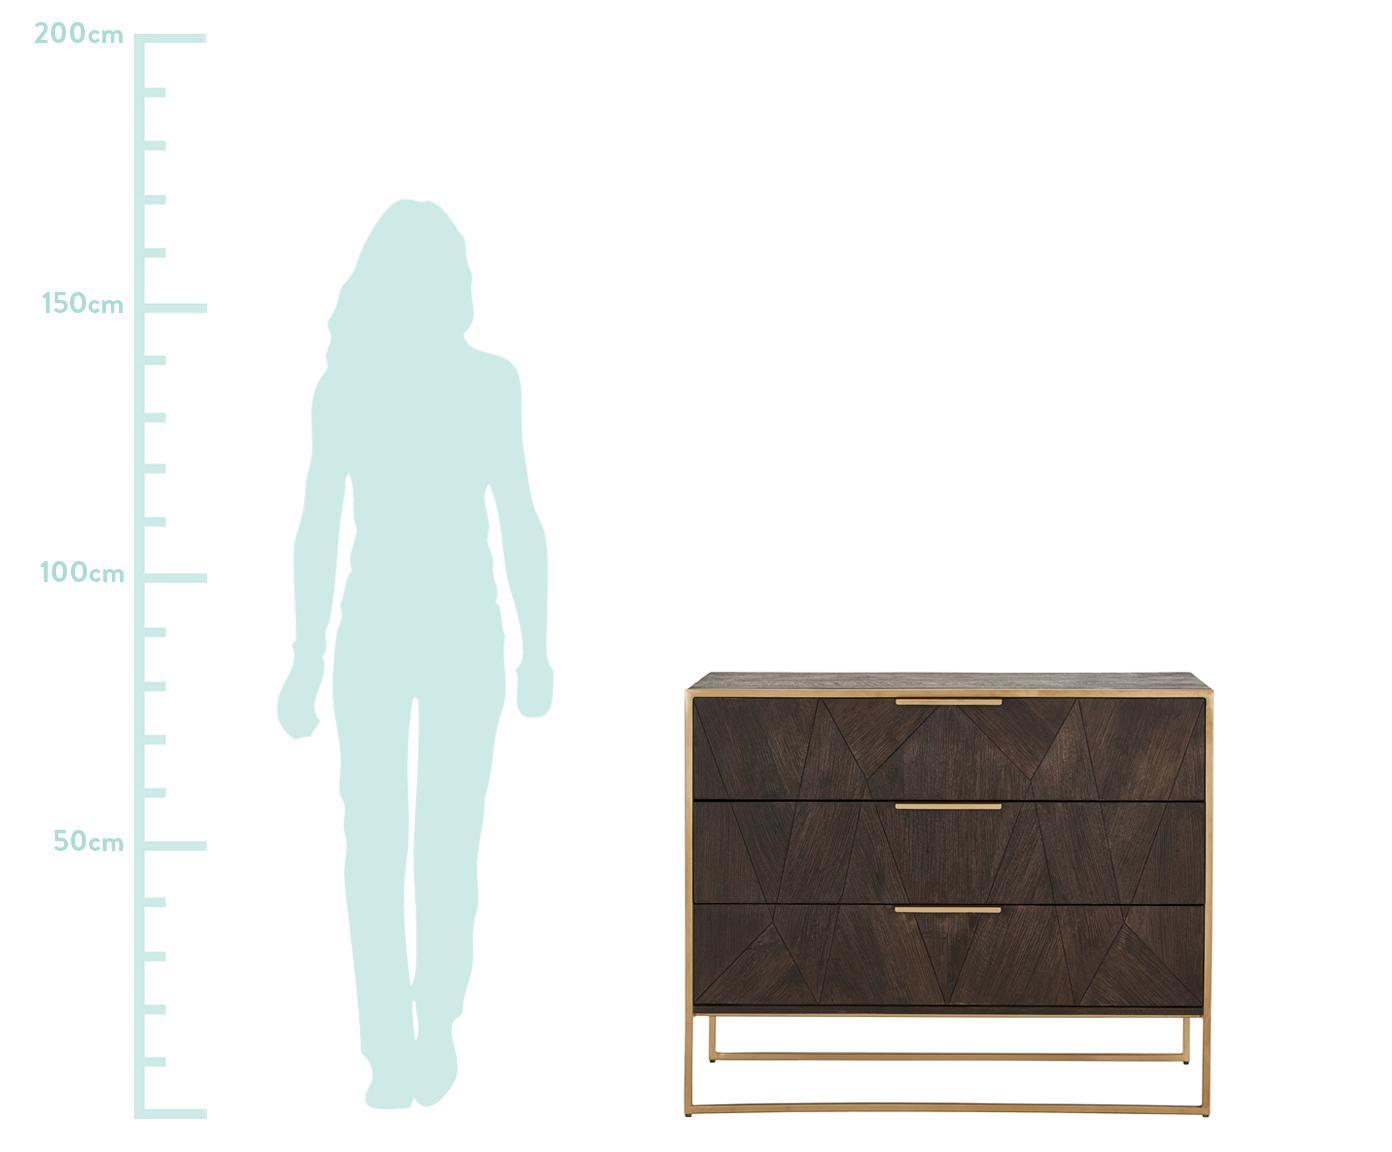 Schubladenkommode Harry aus Massivholz, Korpus: Massives Mangoholz, lacki, Mangoholz, 100 x 80 cm